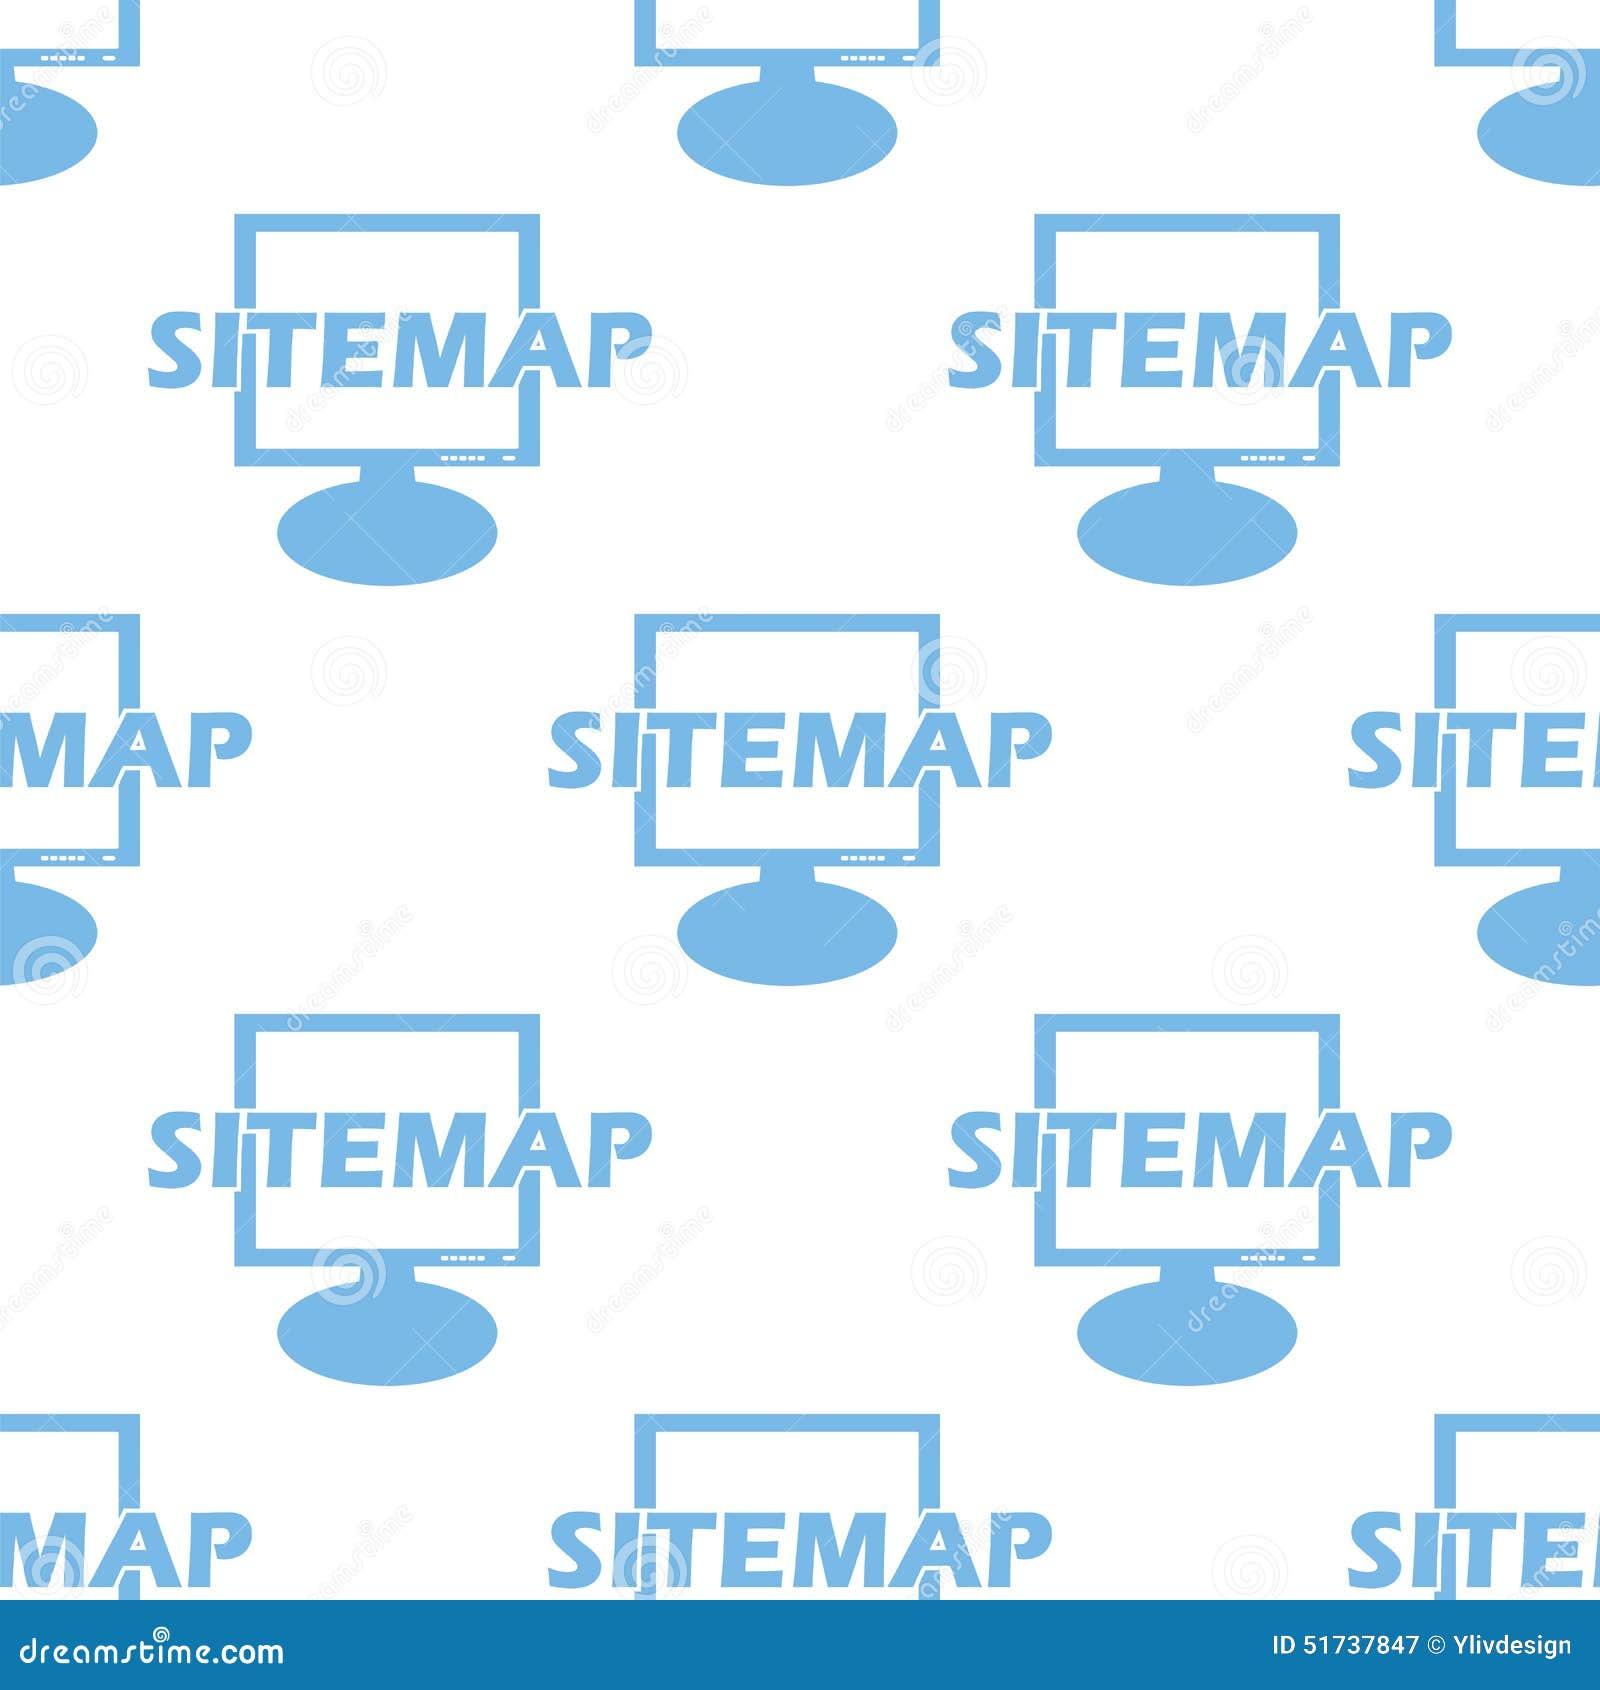 Sitemap seamless pattern